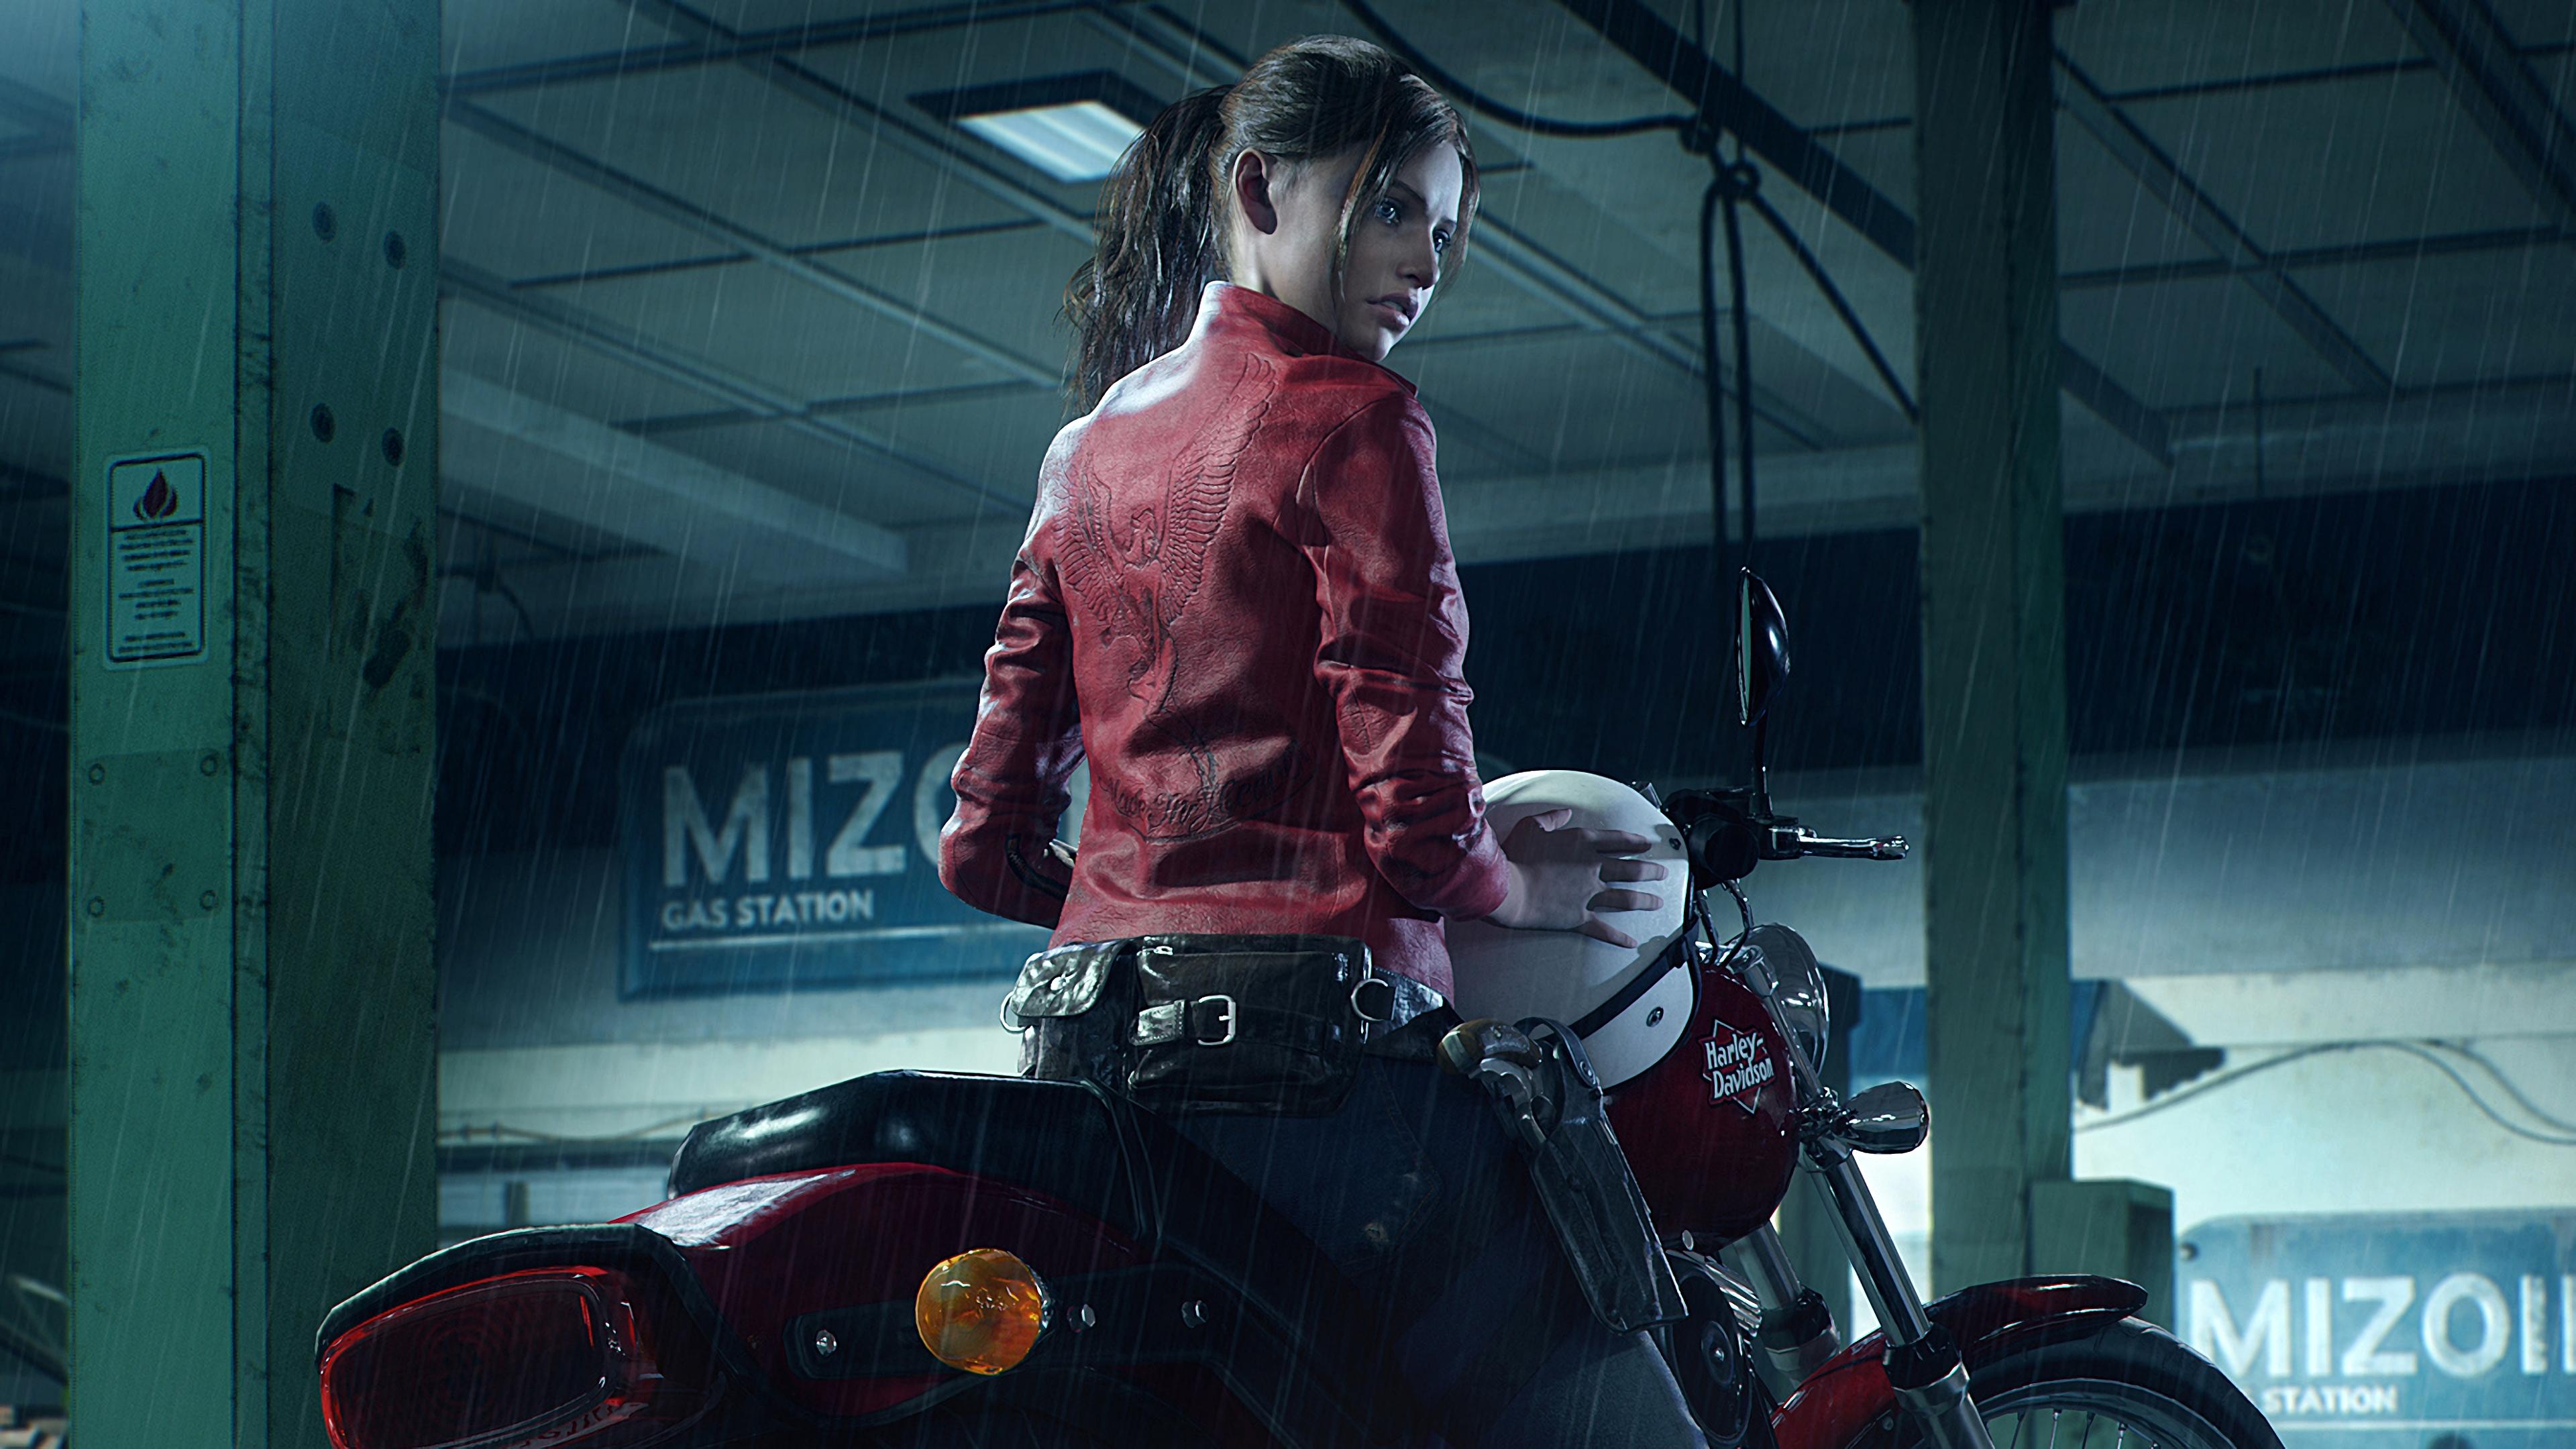 Resident Evil 2 Wallpaper: Resident Evil 2 (2019) Claire's Motorcycle 4k Ultra HD